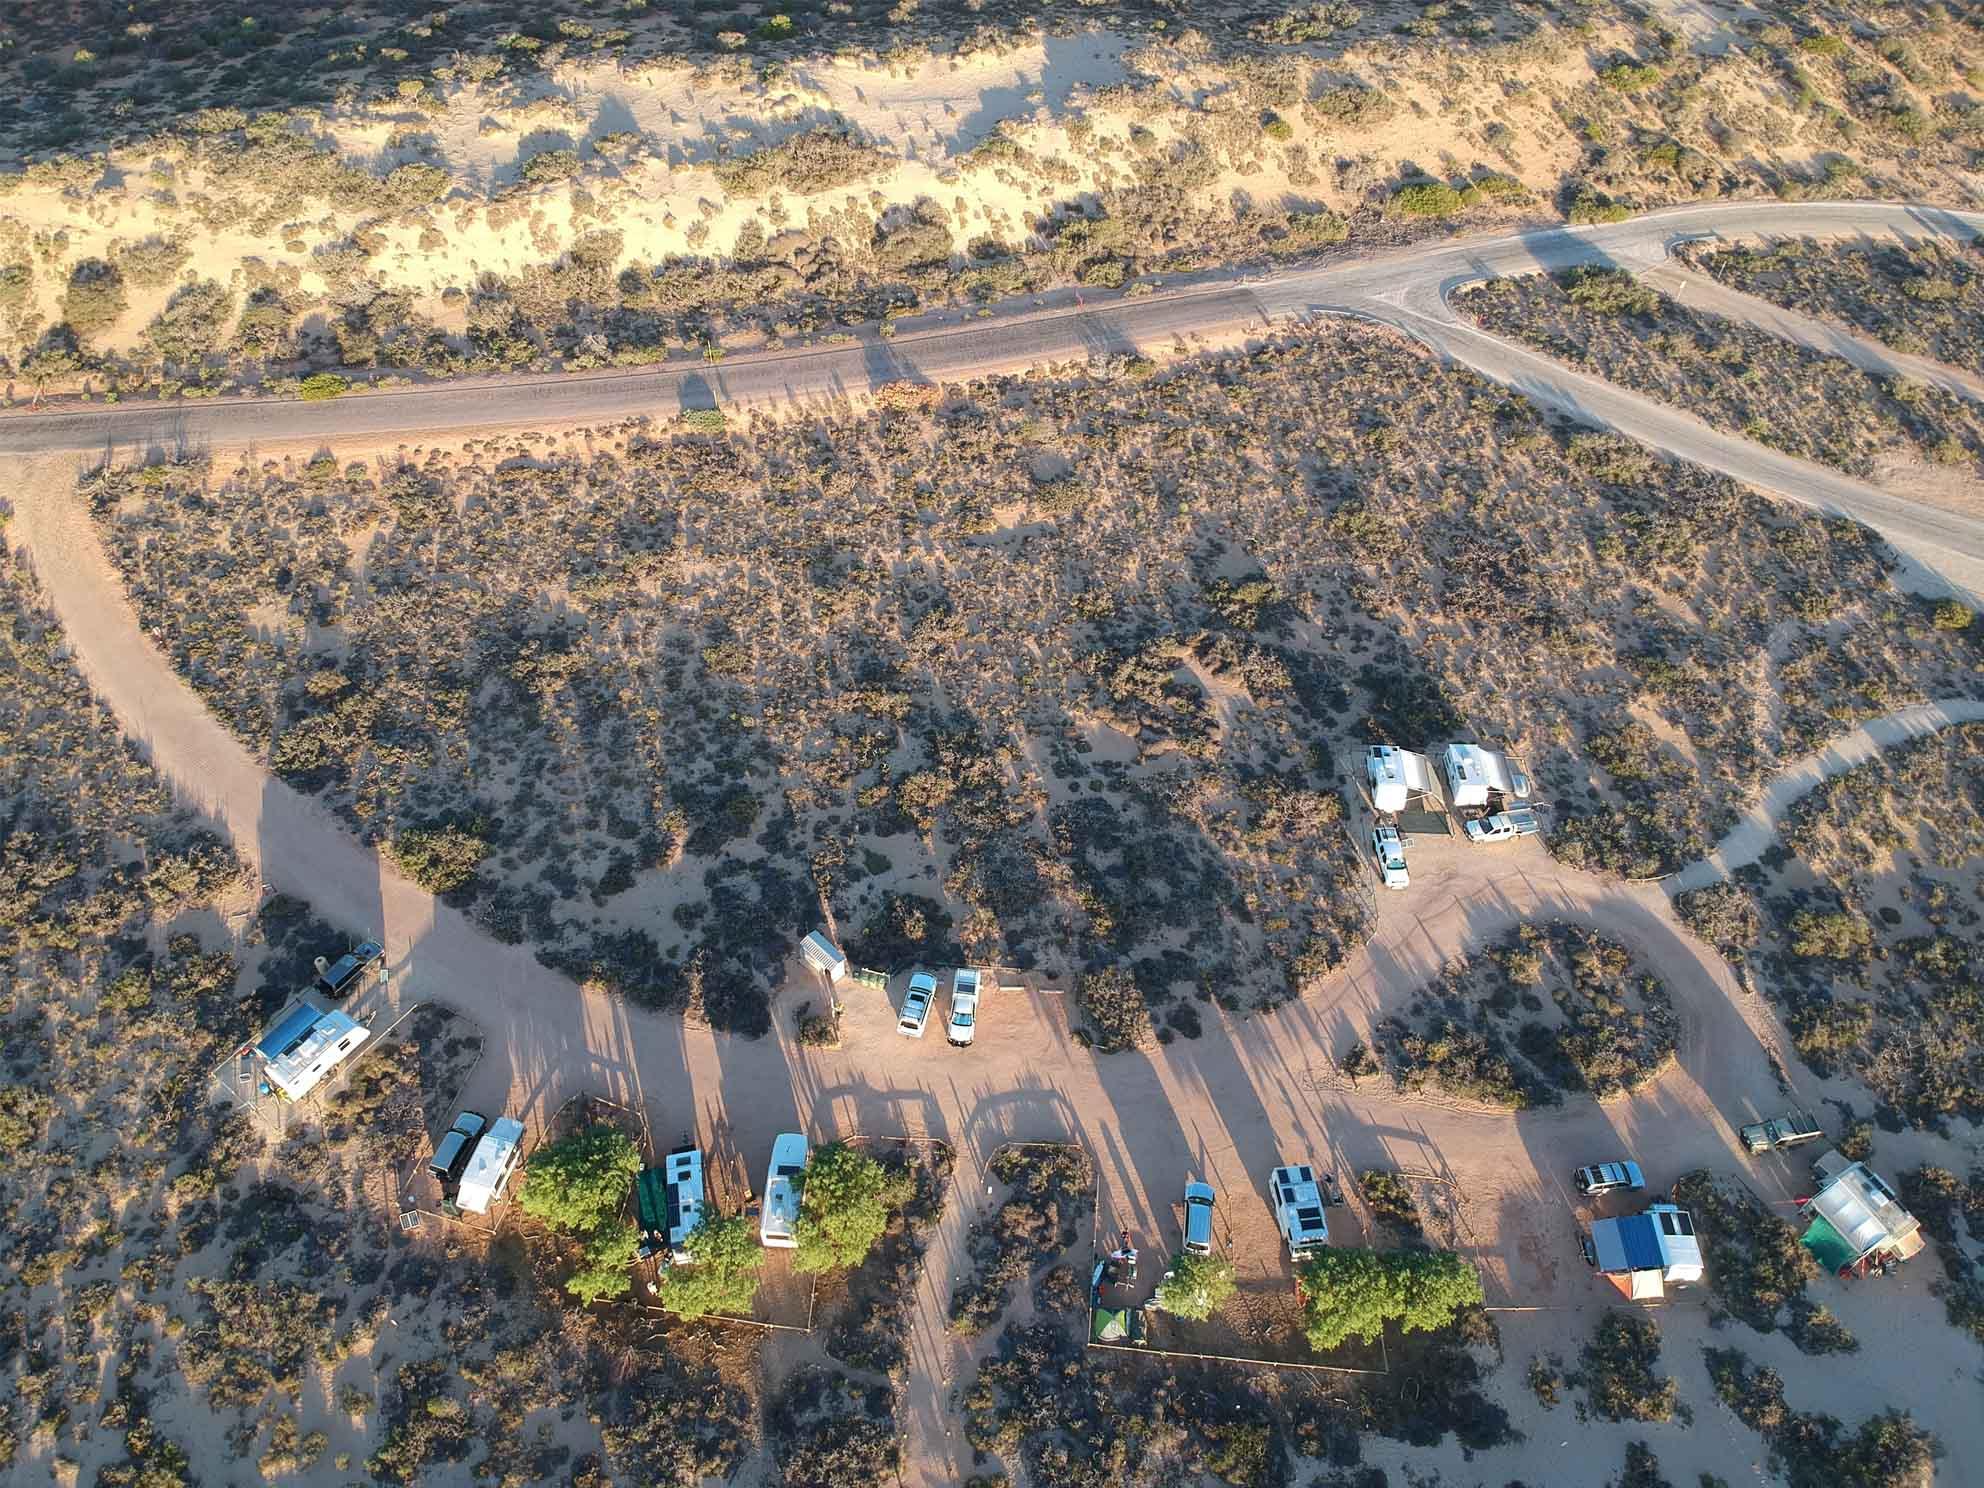 Urlaub im Outback in Australien